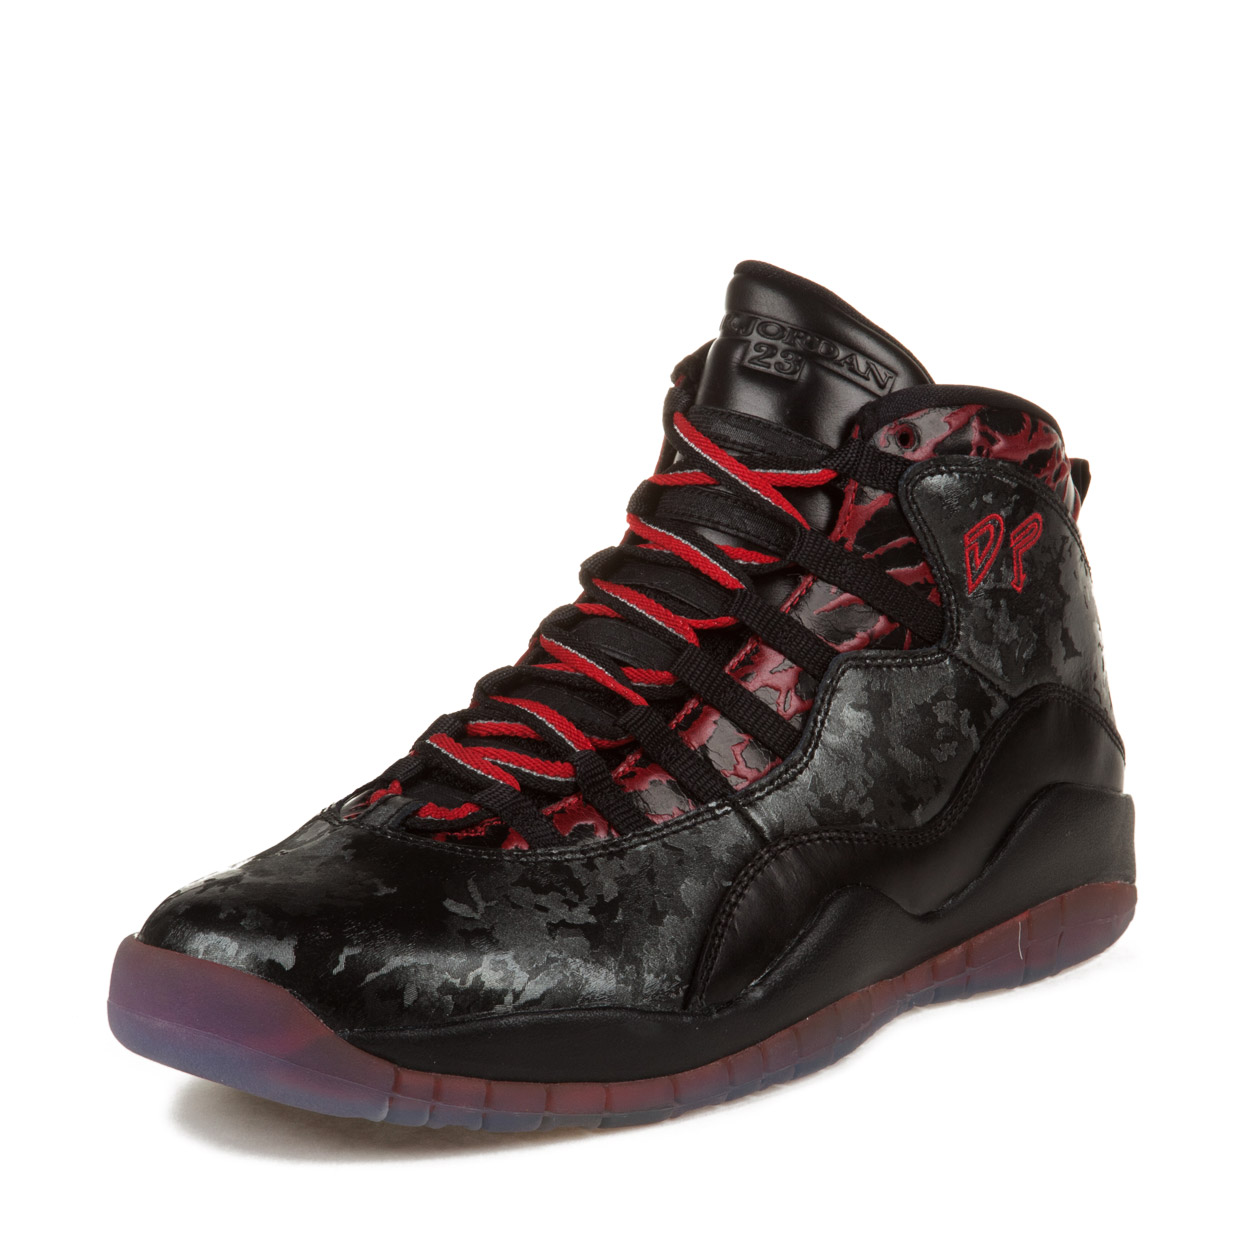 Nike 10 RETRO DB 'DOERNBECHER' - 636214-066